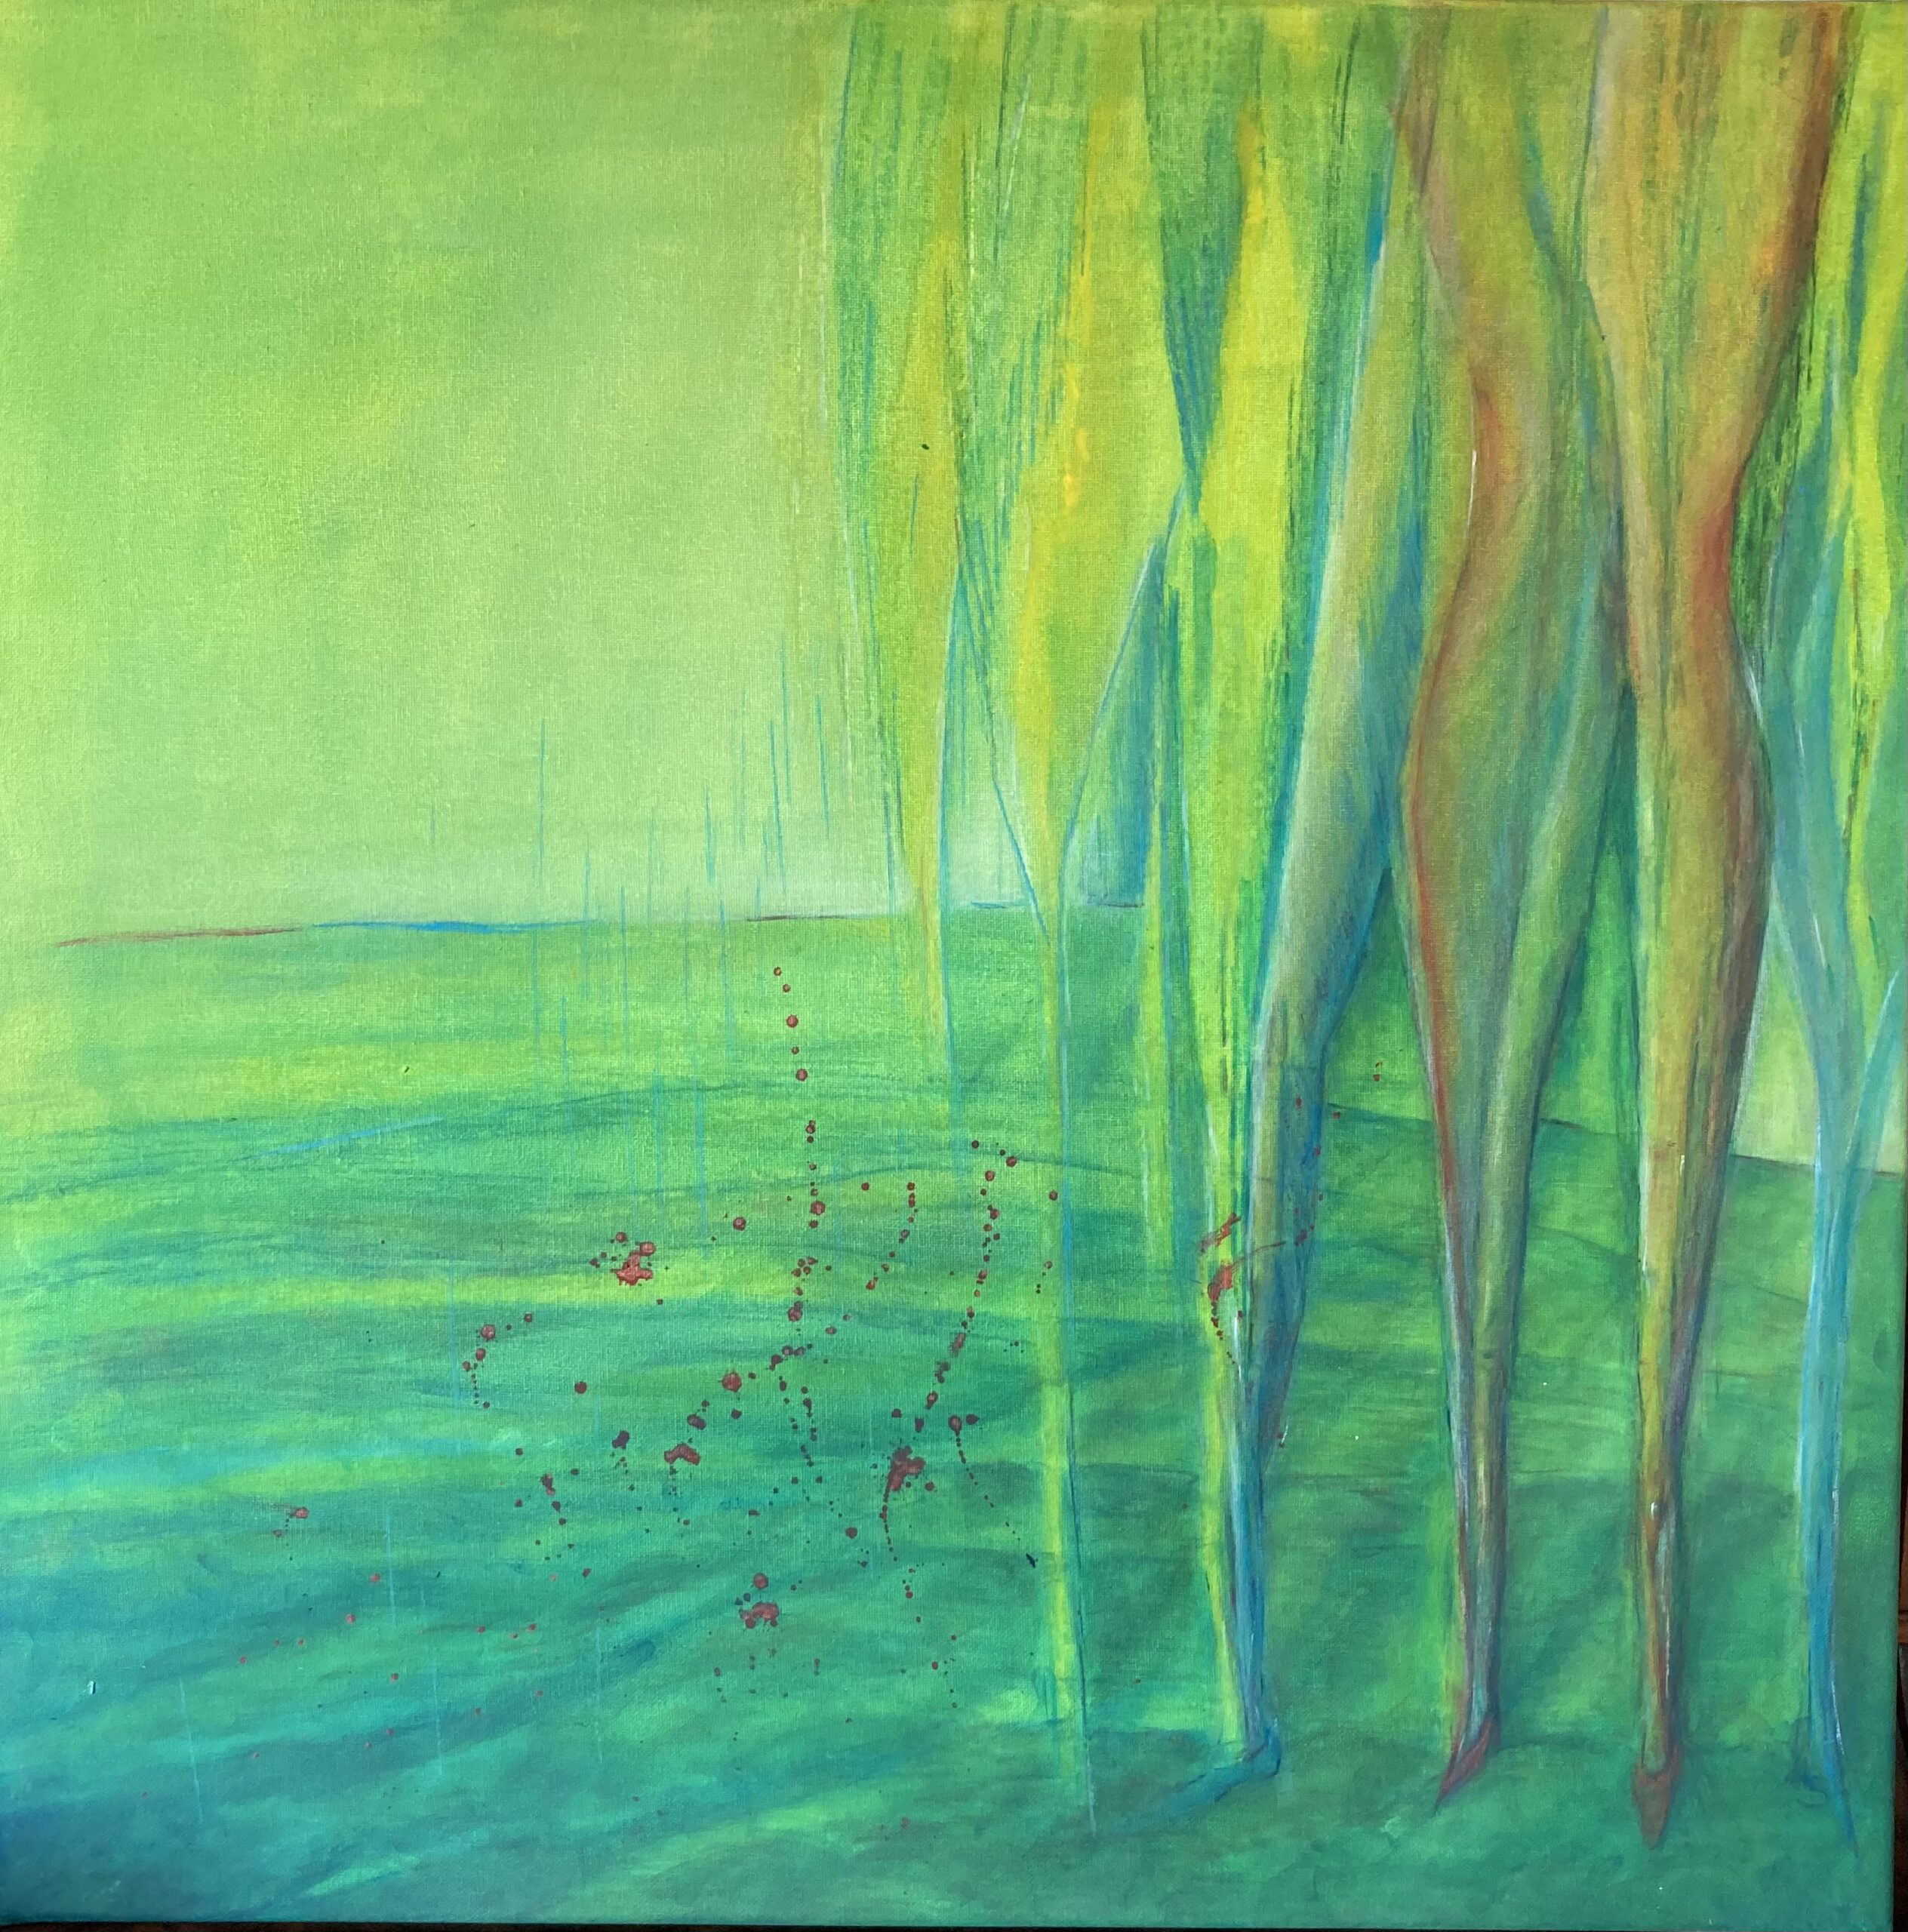 Metamorphosis. 60 x 60 cm. Acryl auf Leinwand. 2021